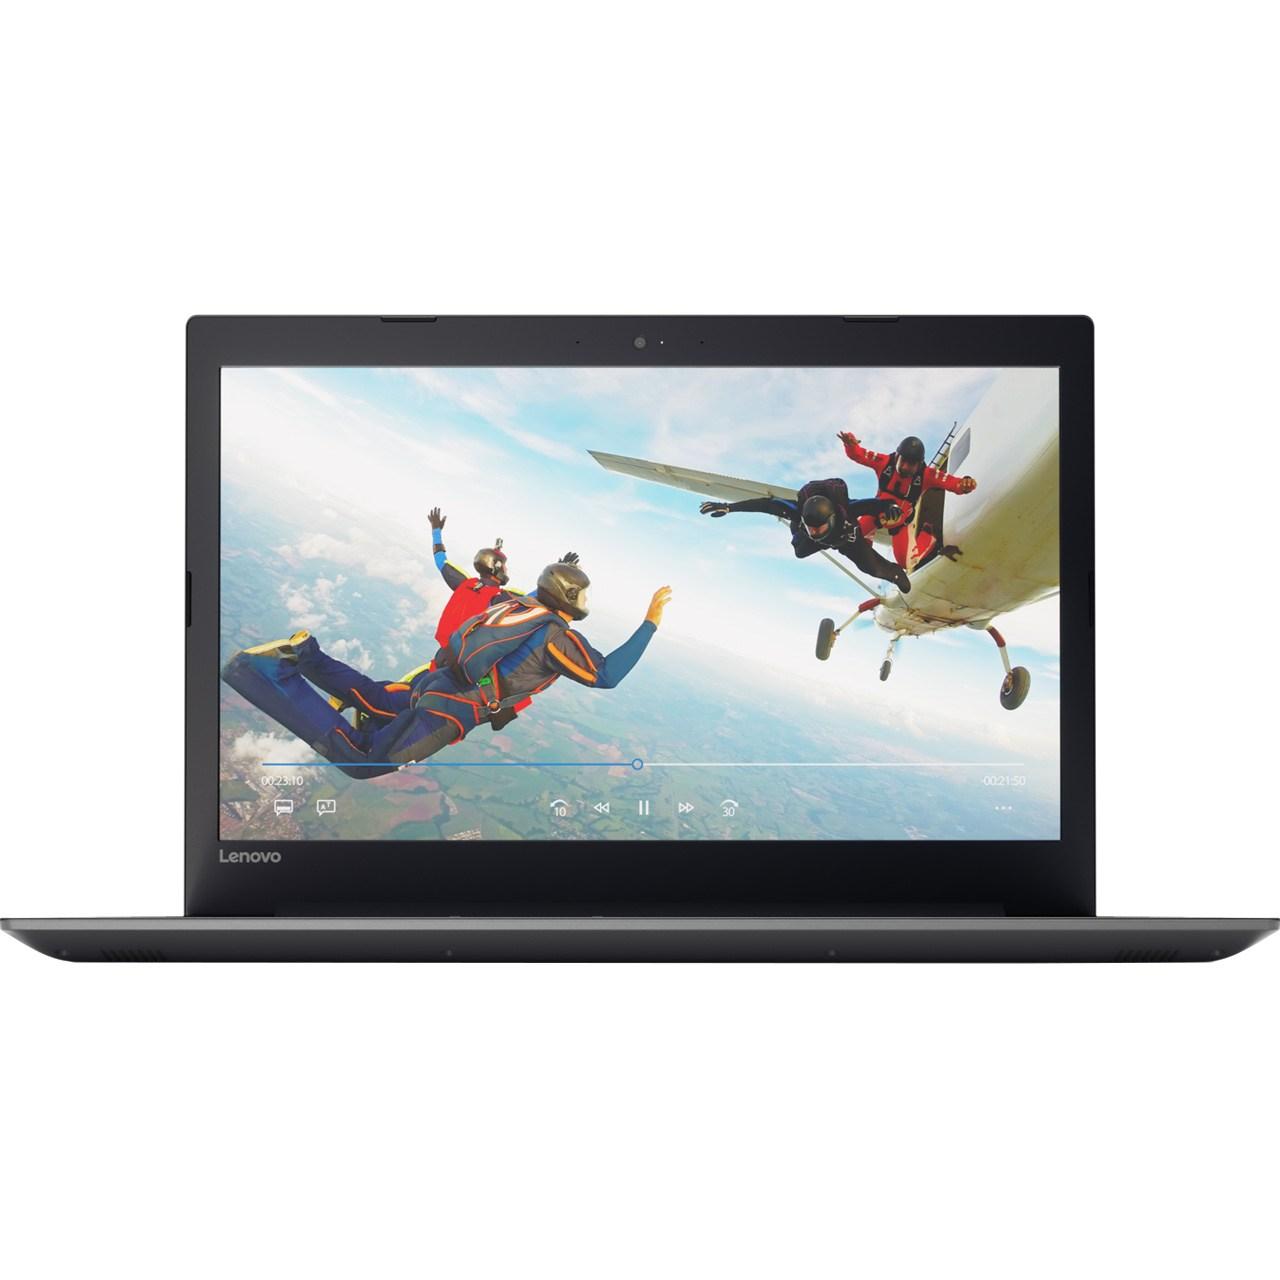 لپ تاپ 15 اینچی لنوو مدل Ideapad 320 - T